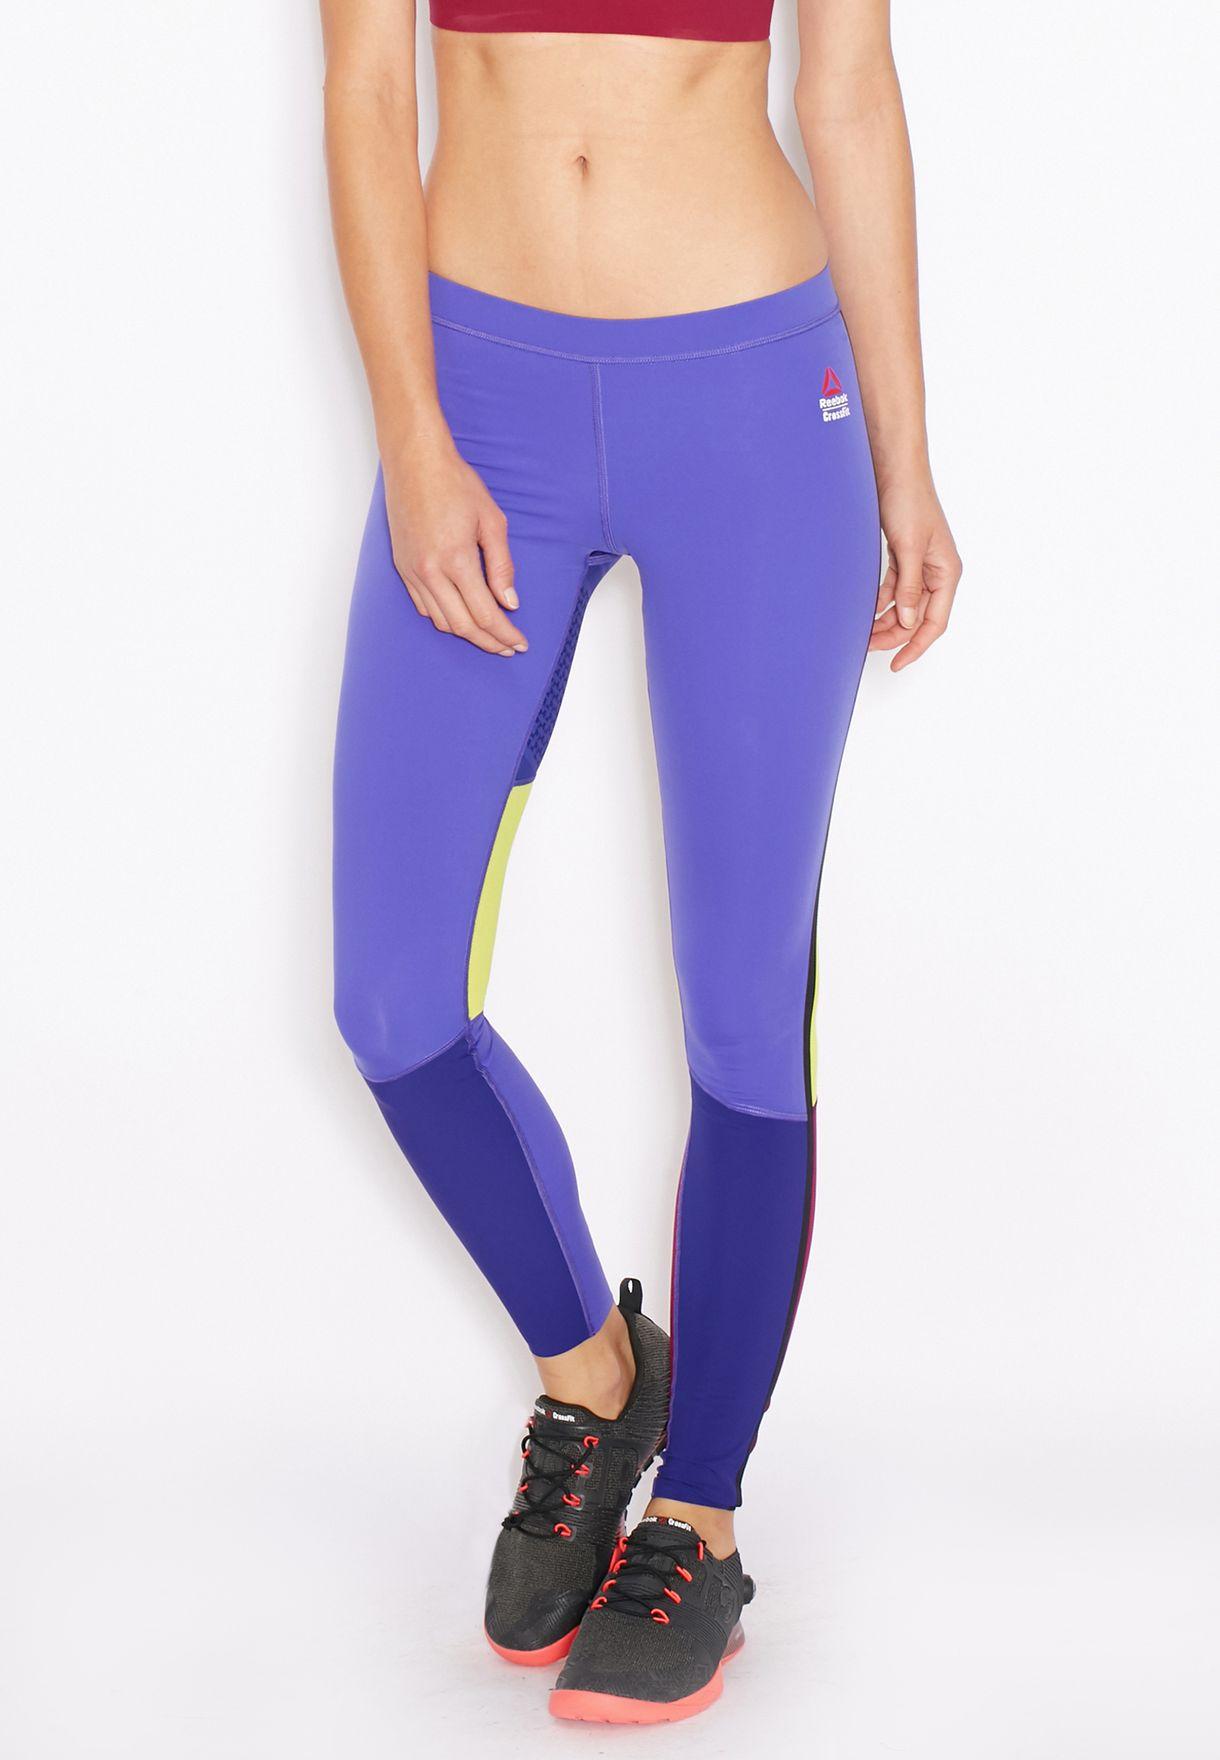 purple crossfit